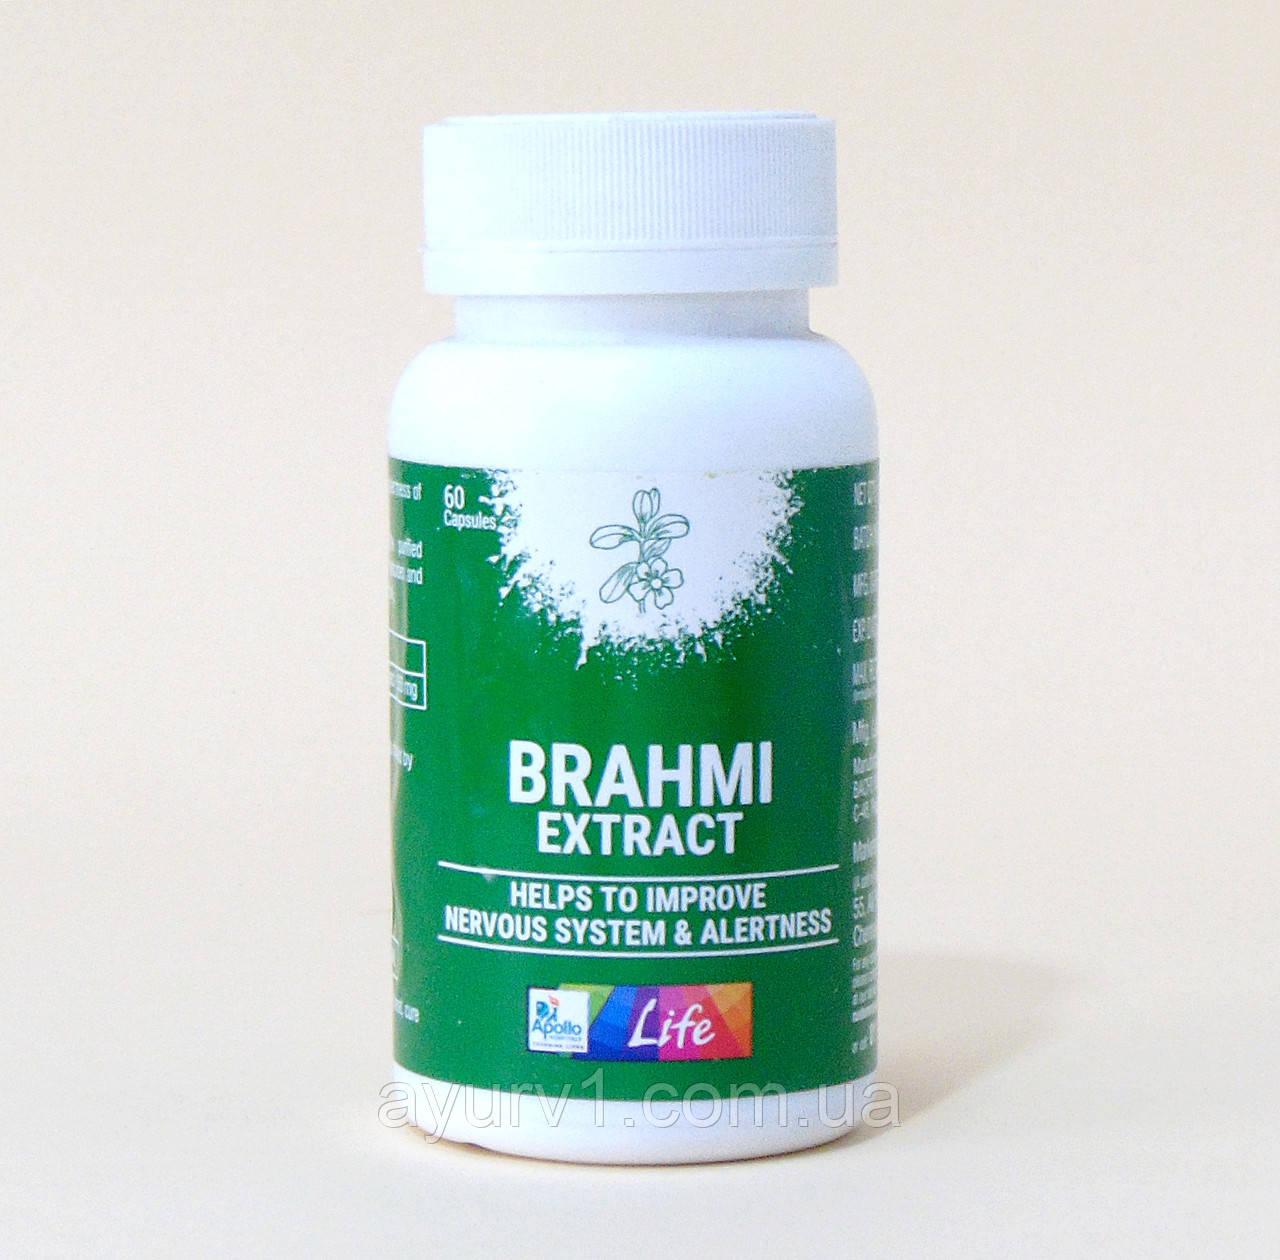 Брами Экстракт в капсулах, Аполло  / Brahmi Extract, Apollo / 60 кап.